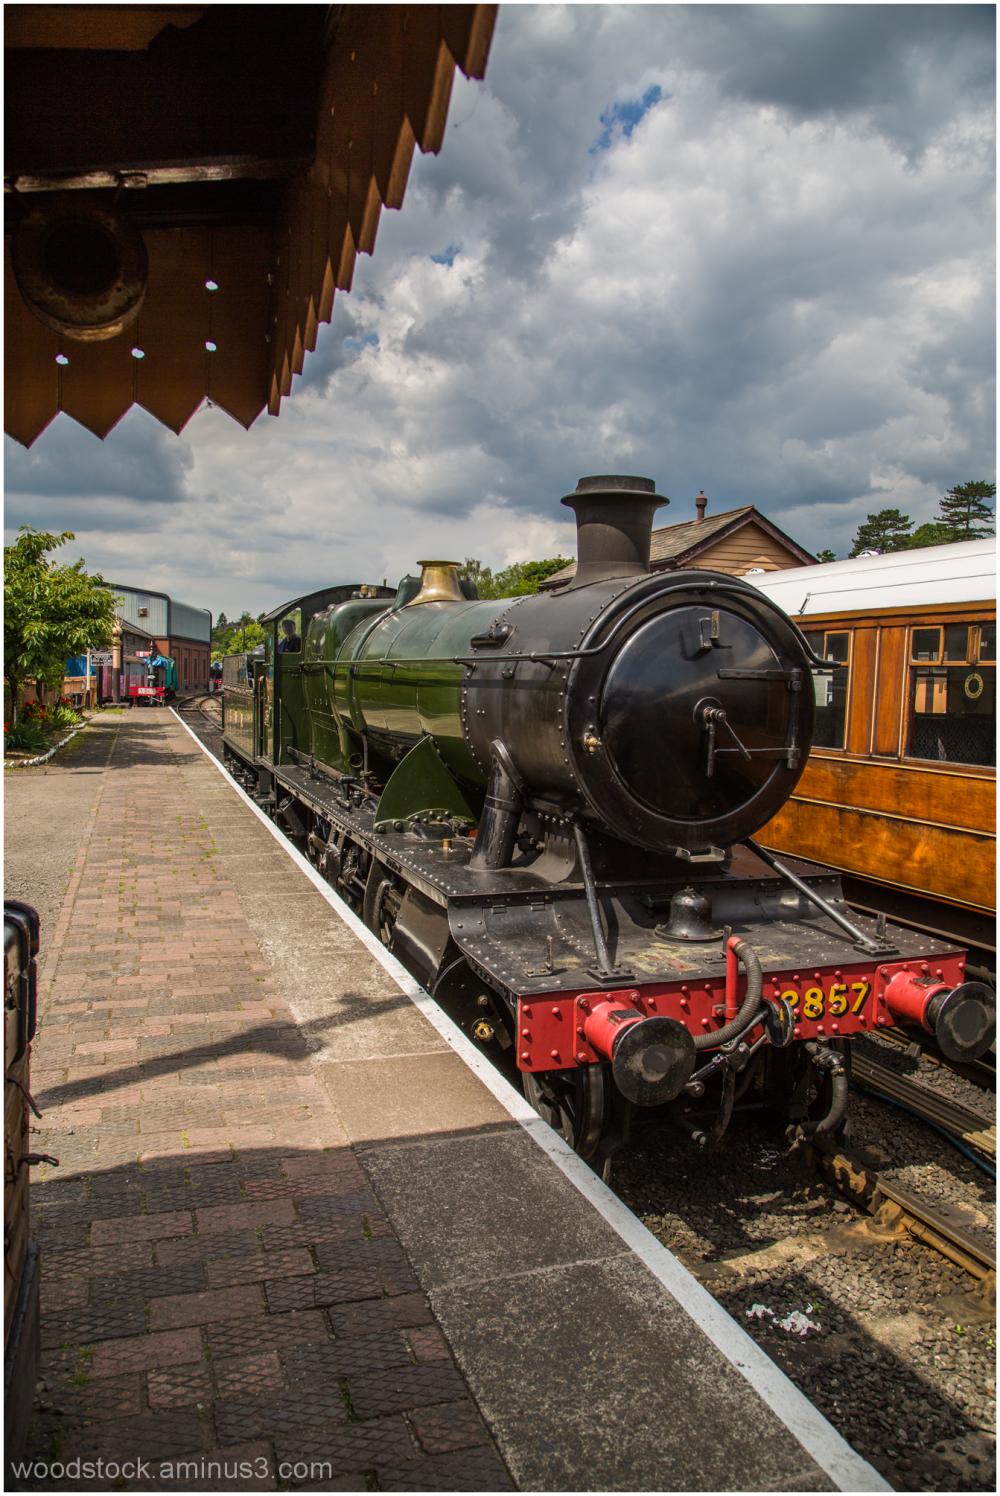 The Train Arriving at Platform 1